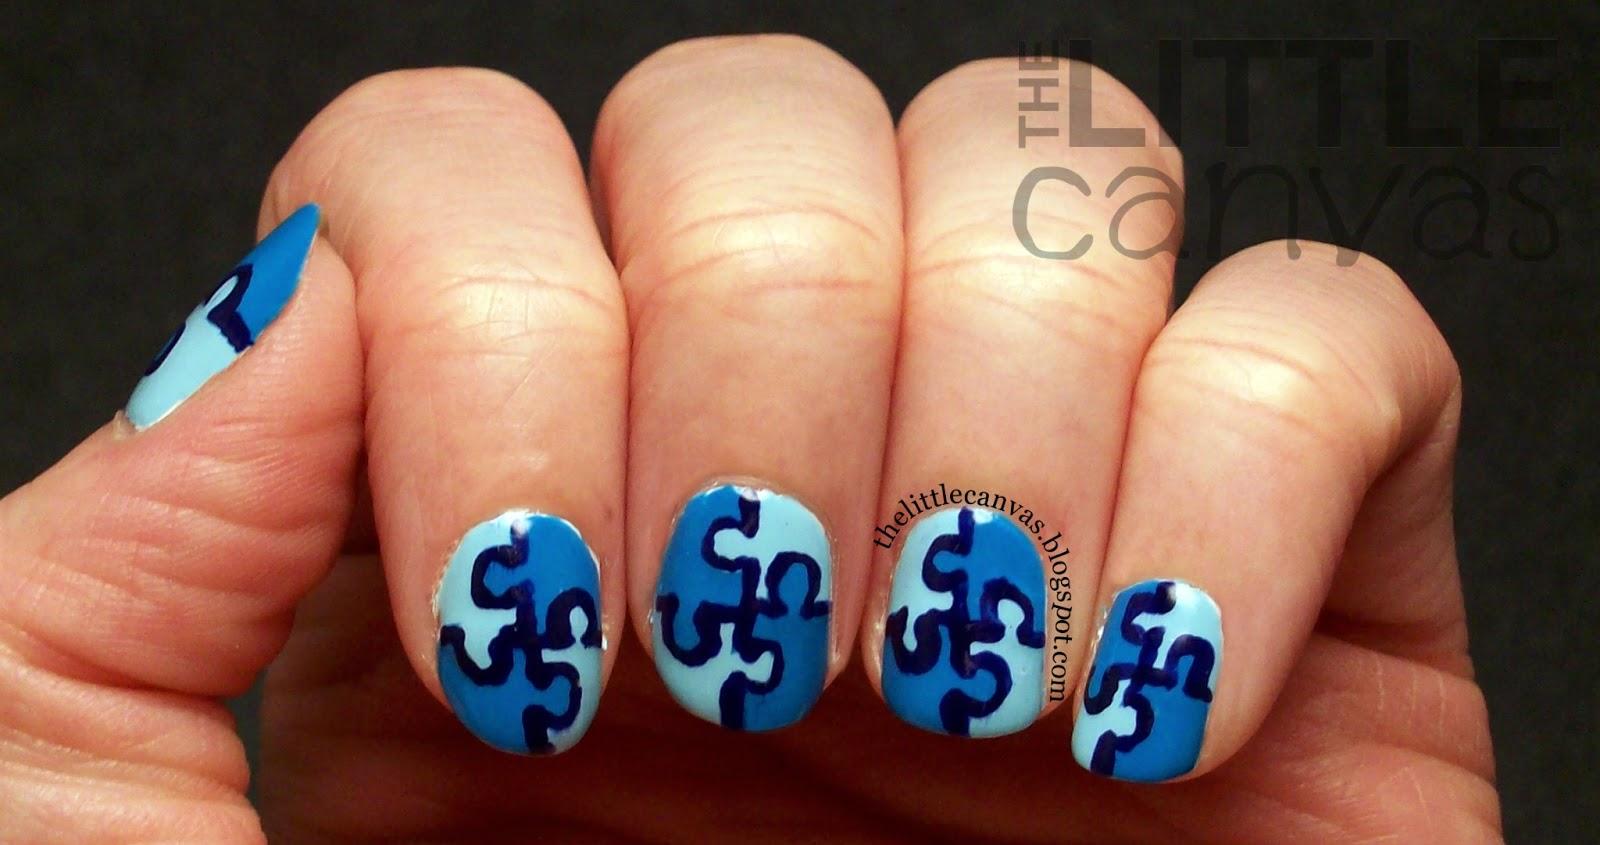 Autism Awareness - Puzzle Piece Manicure: Take 2 - The Little Canvas